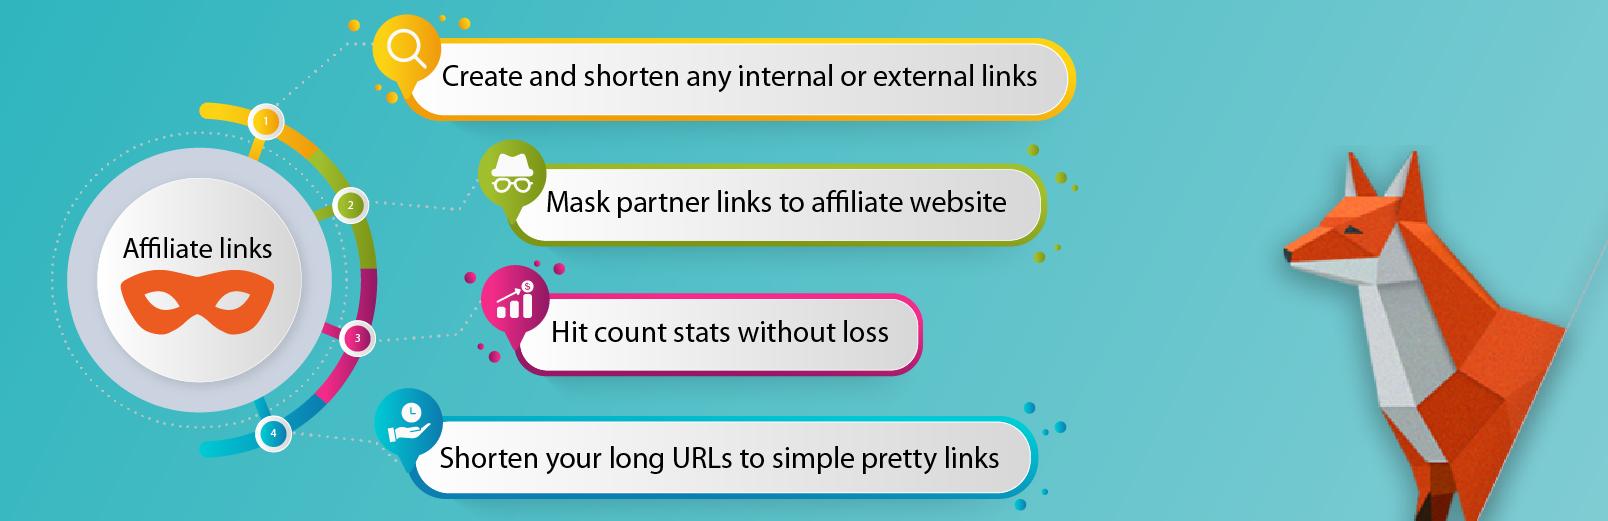 WordPress Affiliate Links Lite Plugin Banner Image